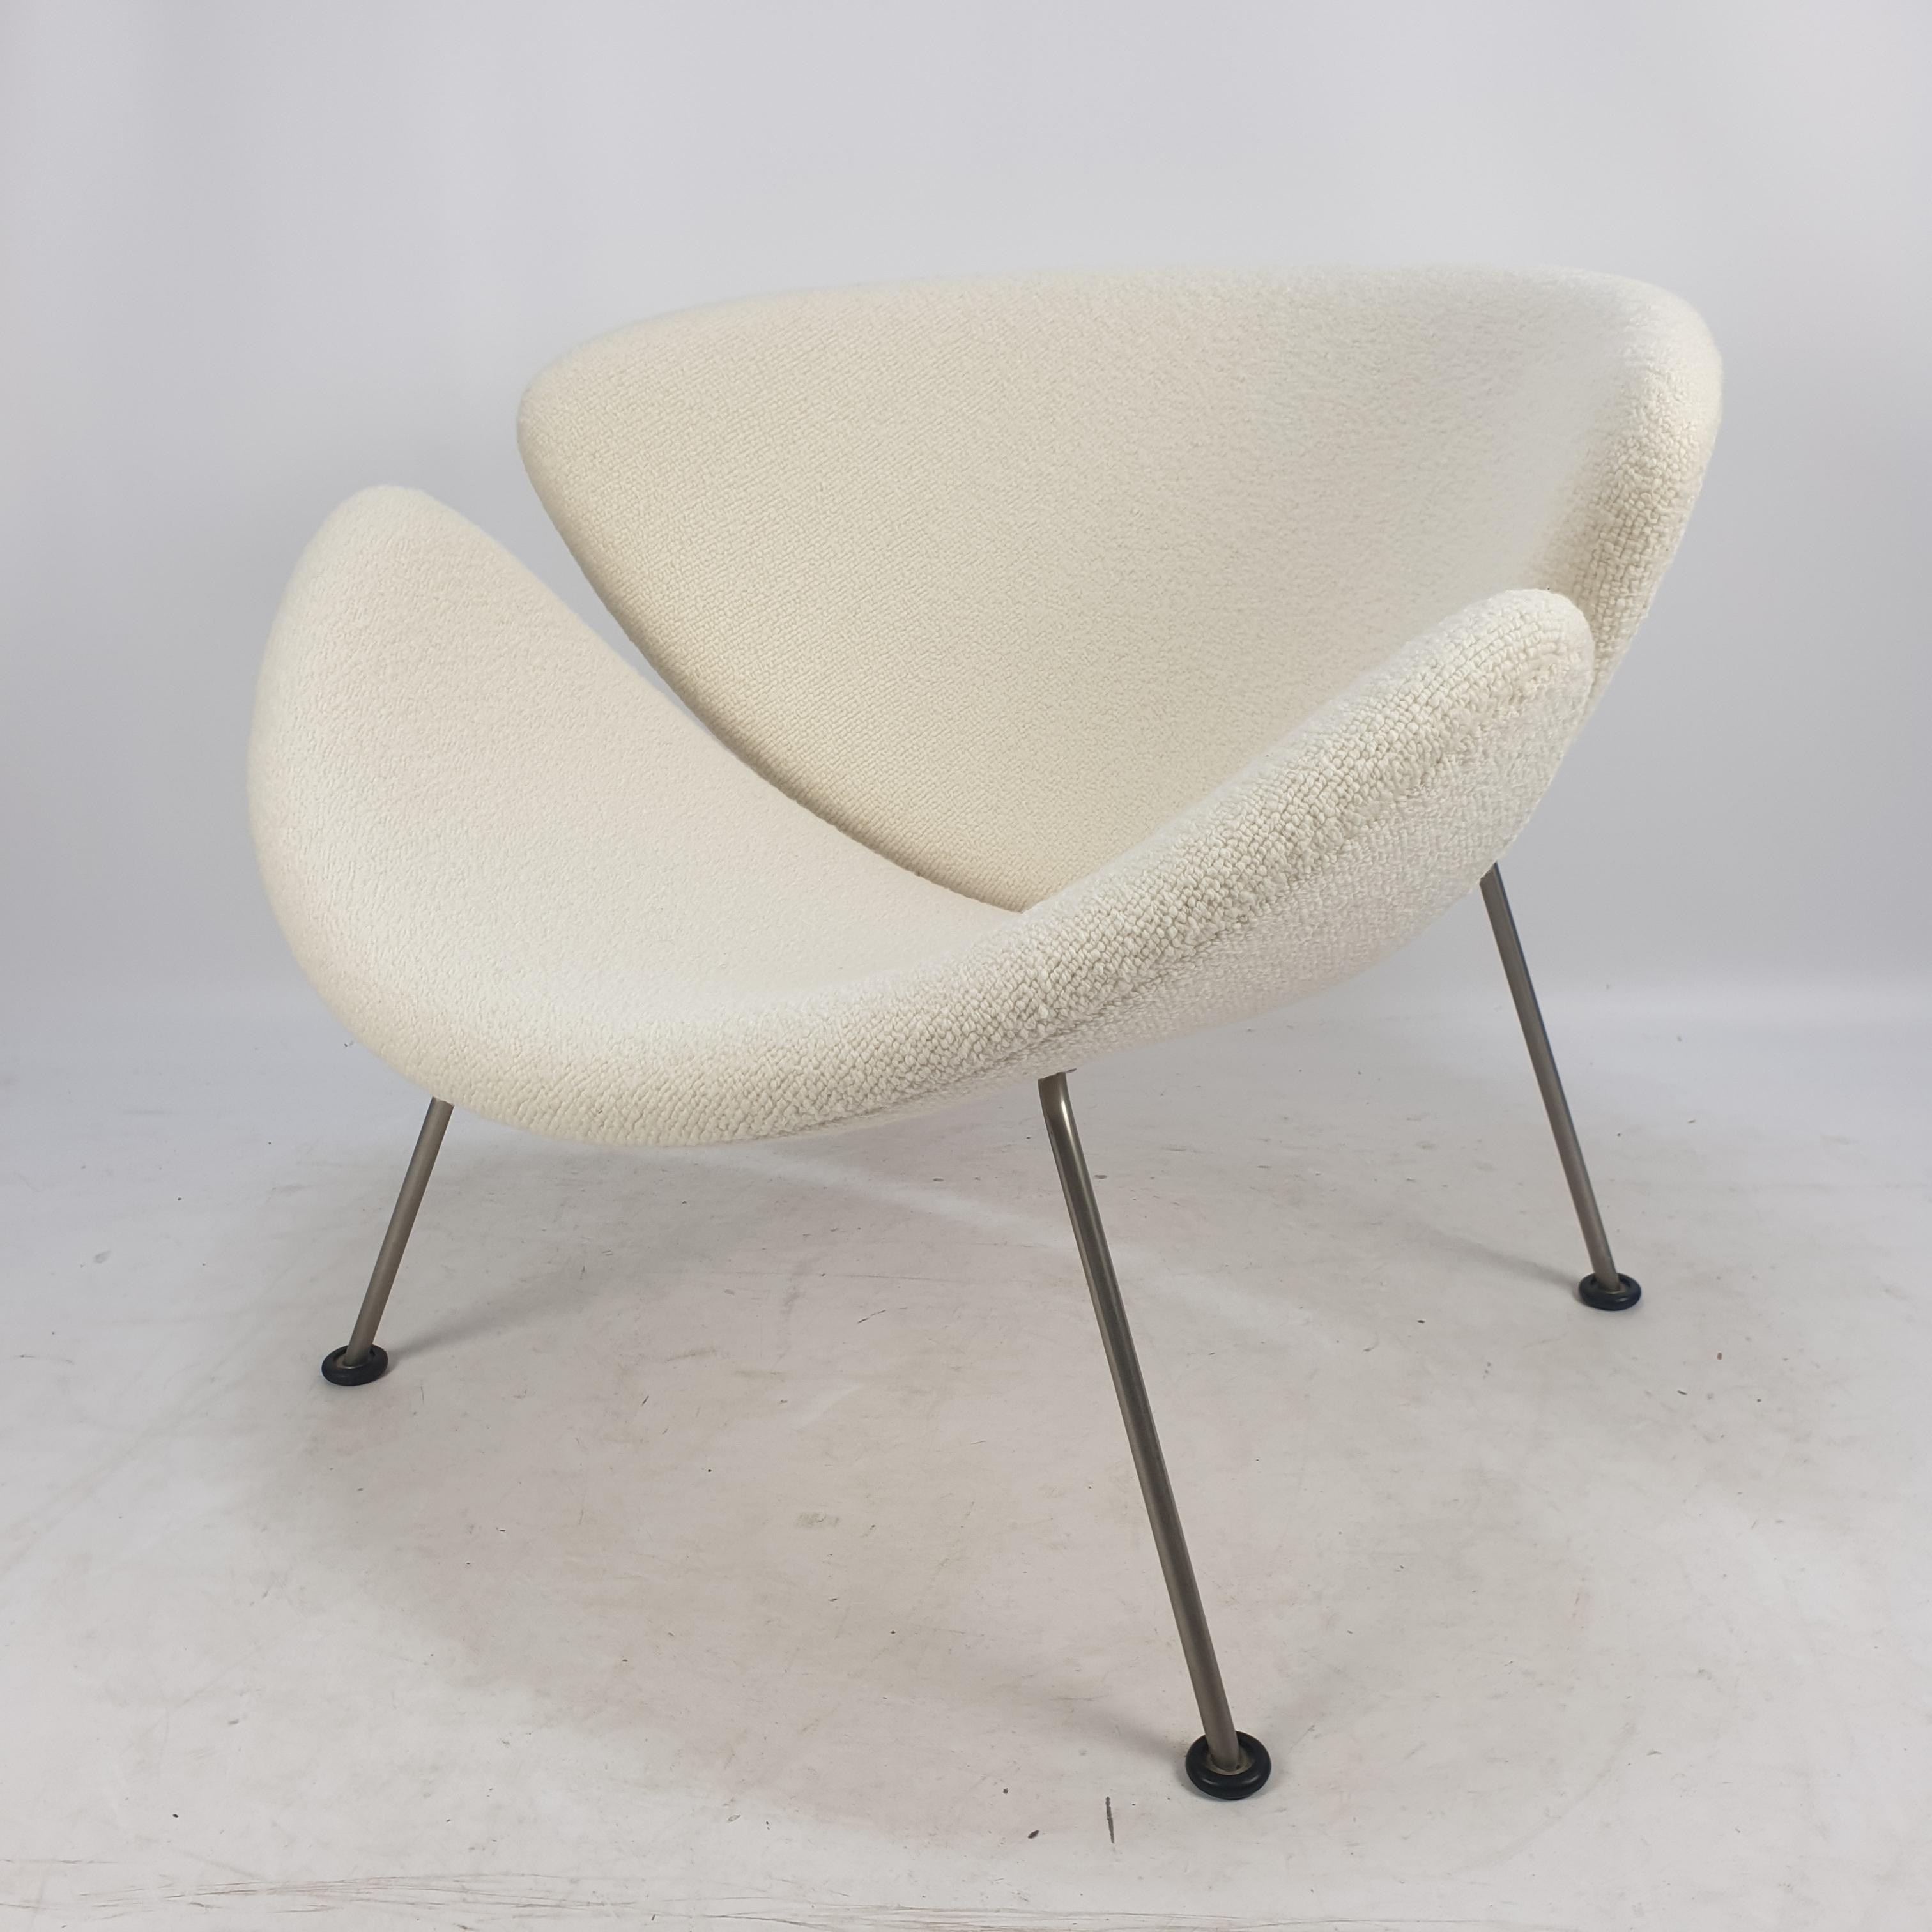 Artifort Orange Slice Chair. Designed by Pierre Paulin.